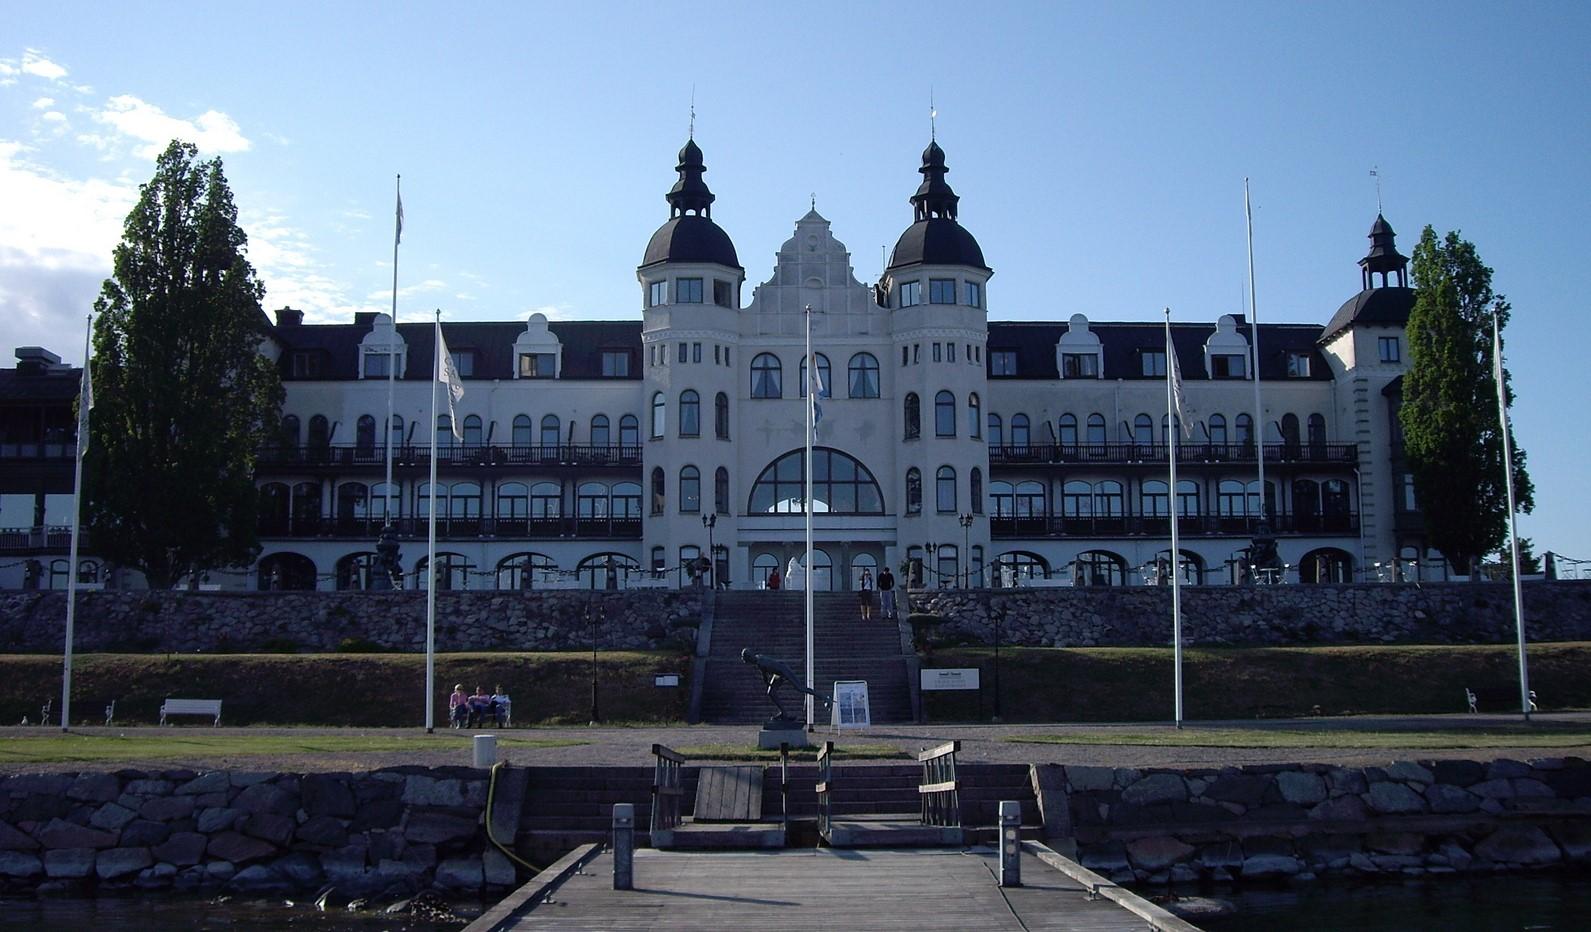 Grandhotel Saltsjöbaden